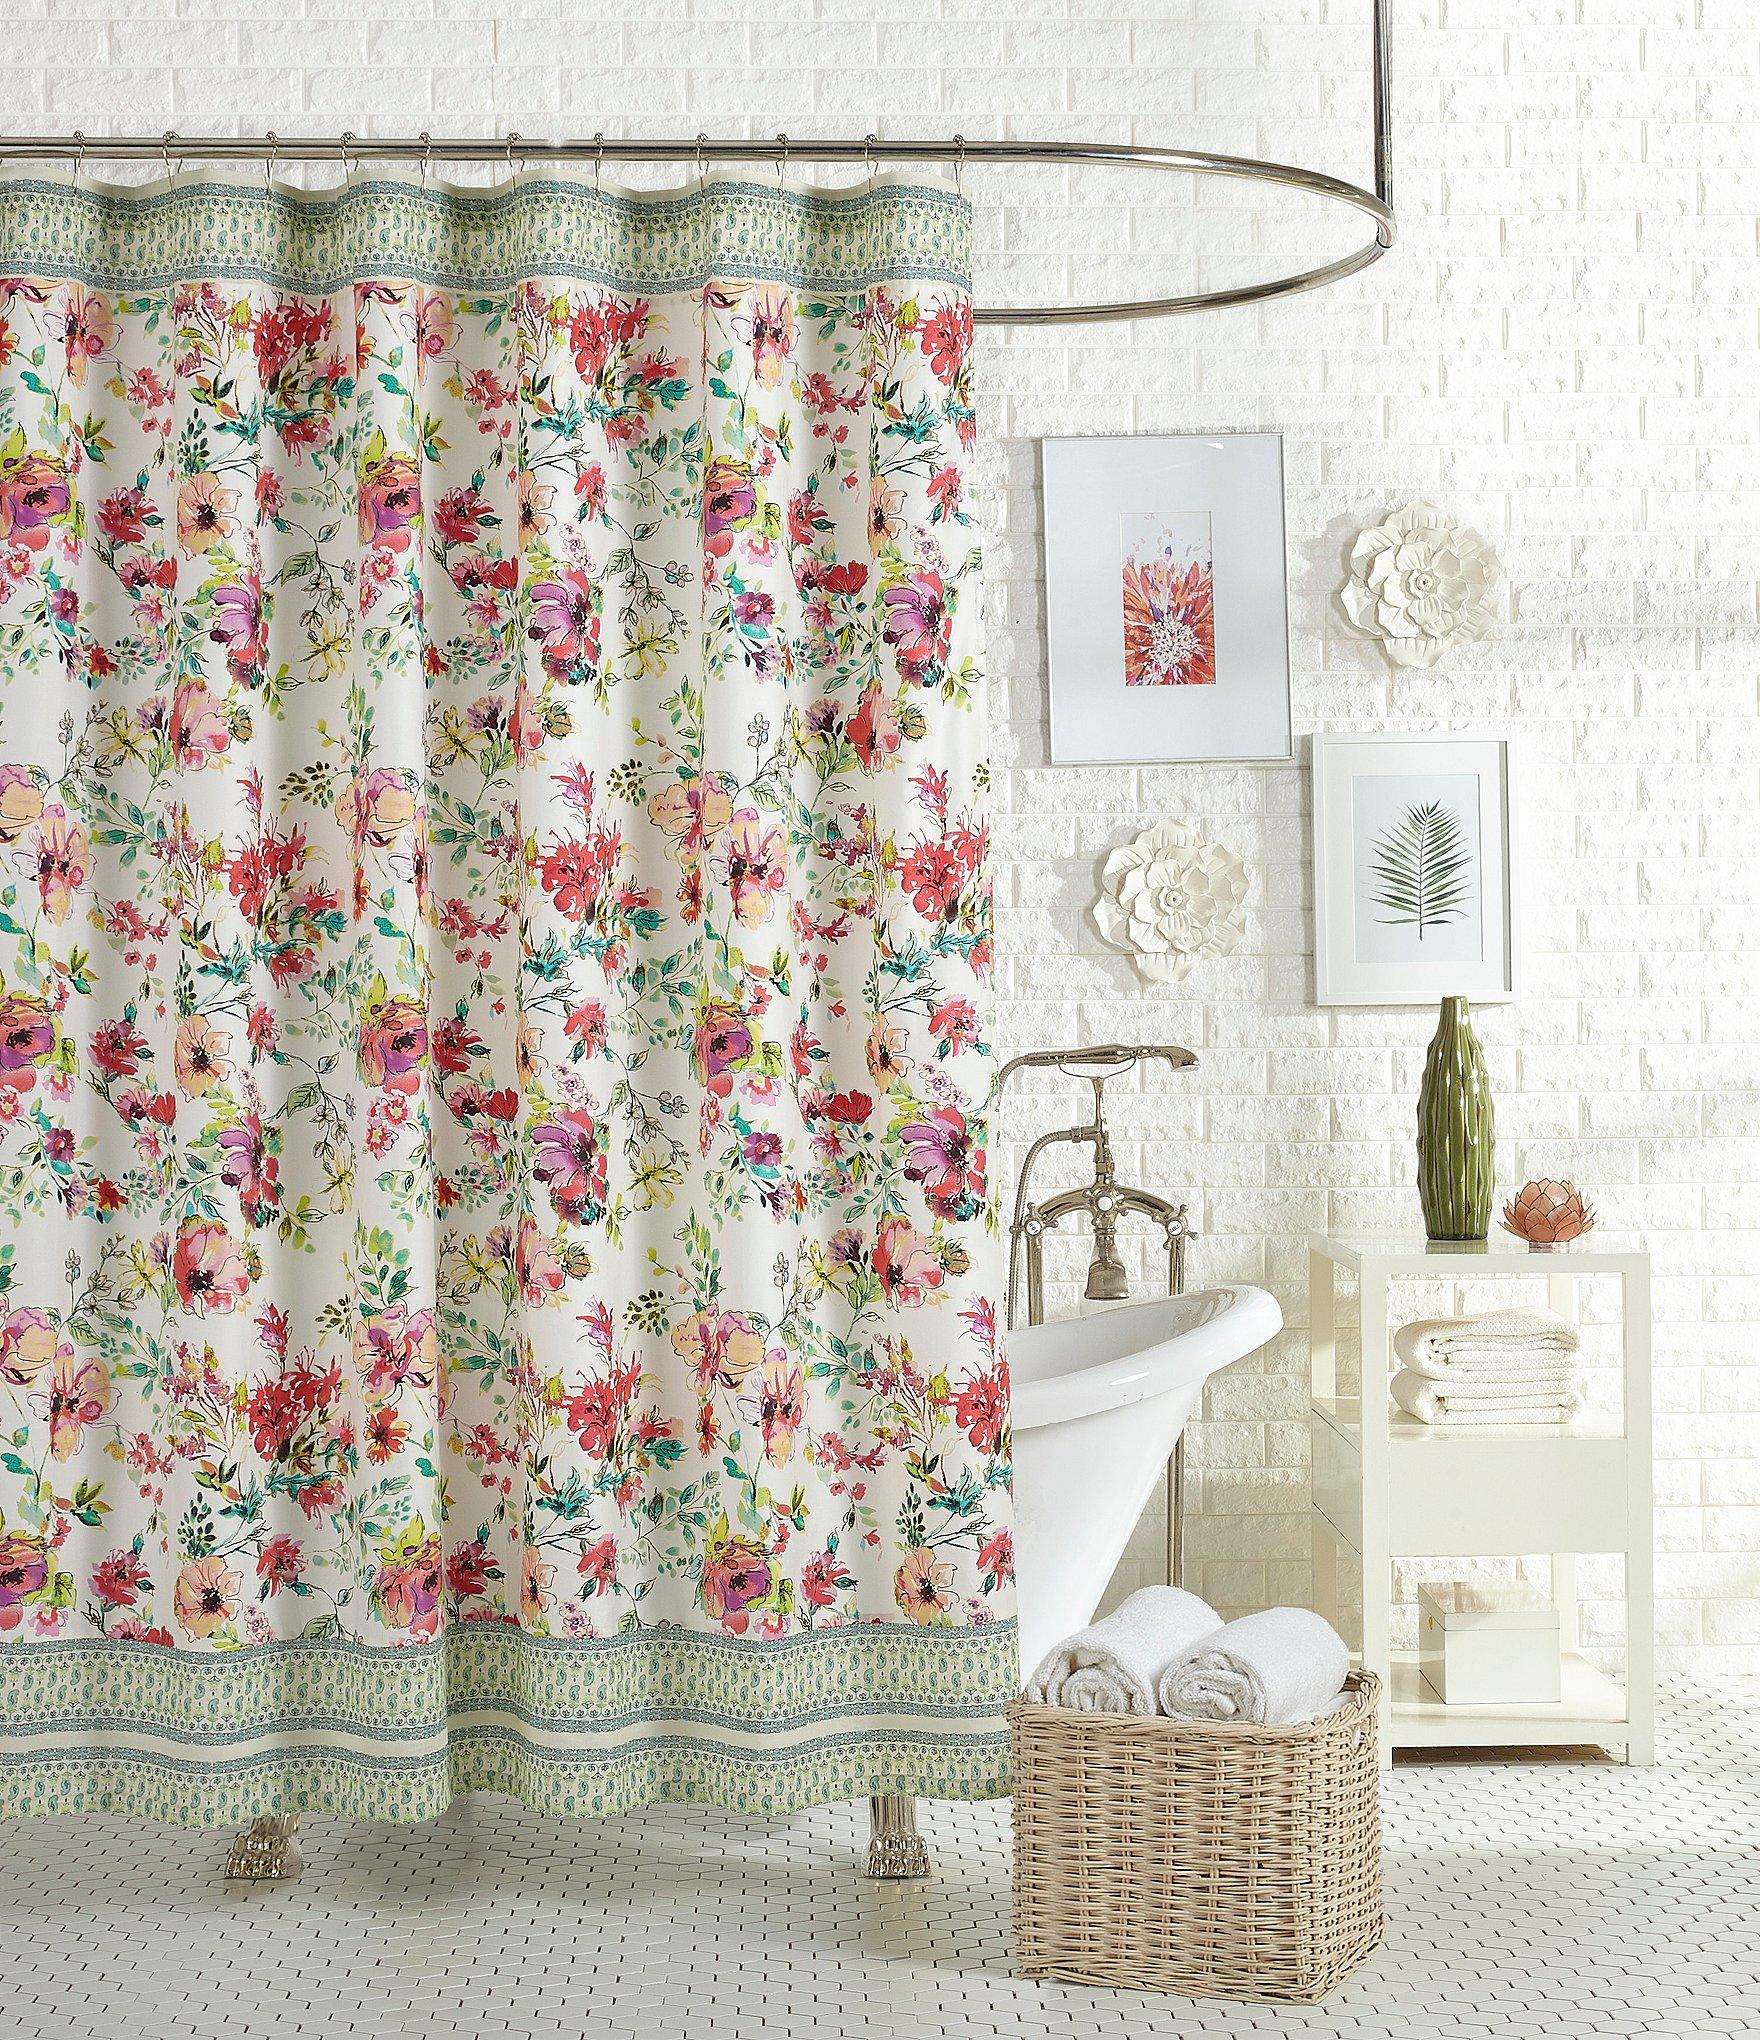 Jessica simpson watercolor garden floral paisley shower curtain dillards for Dillards bathroom accessories sets